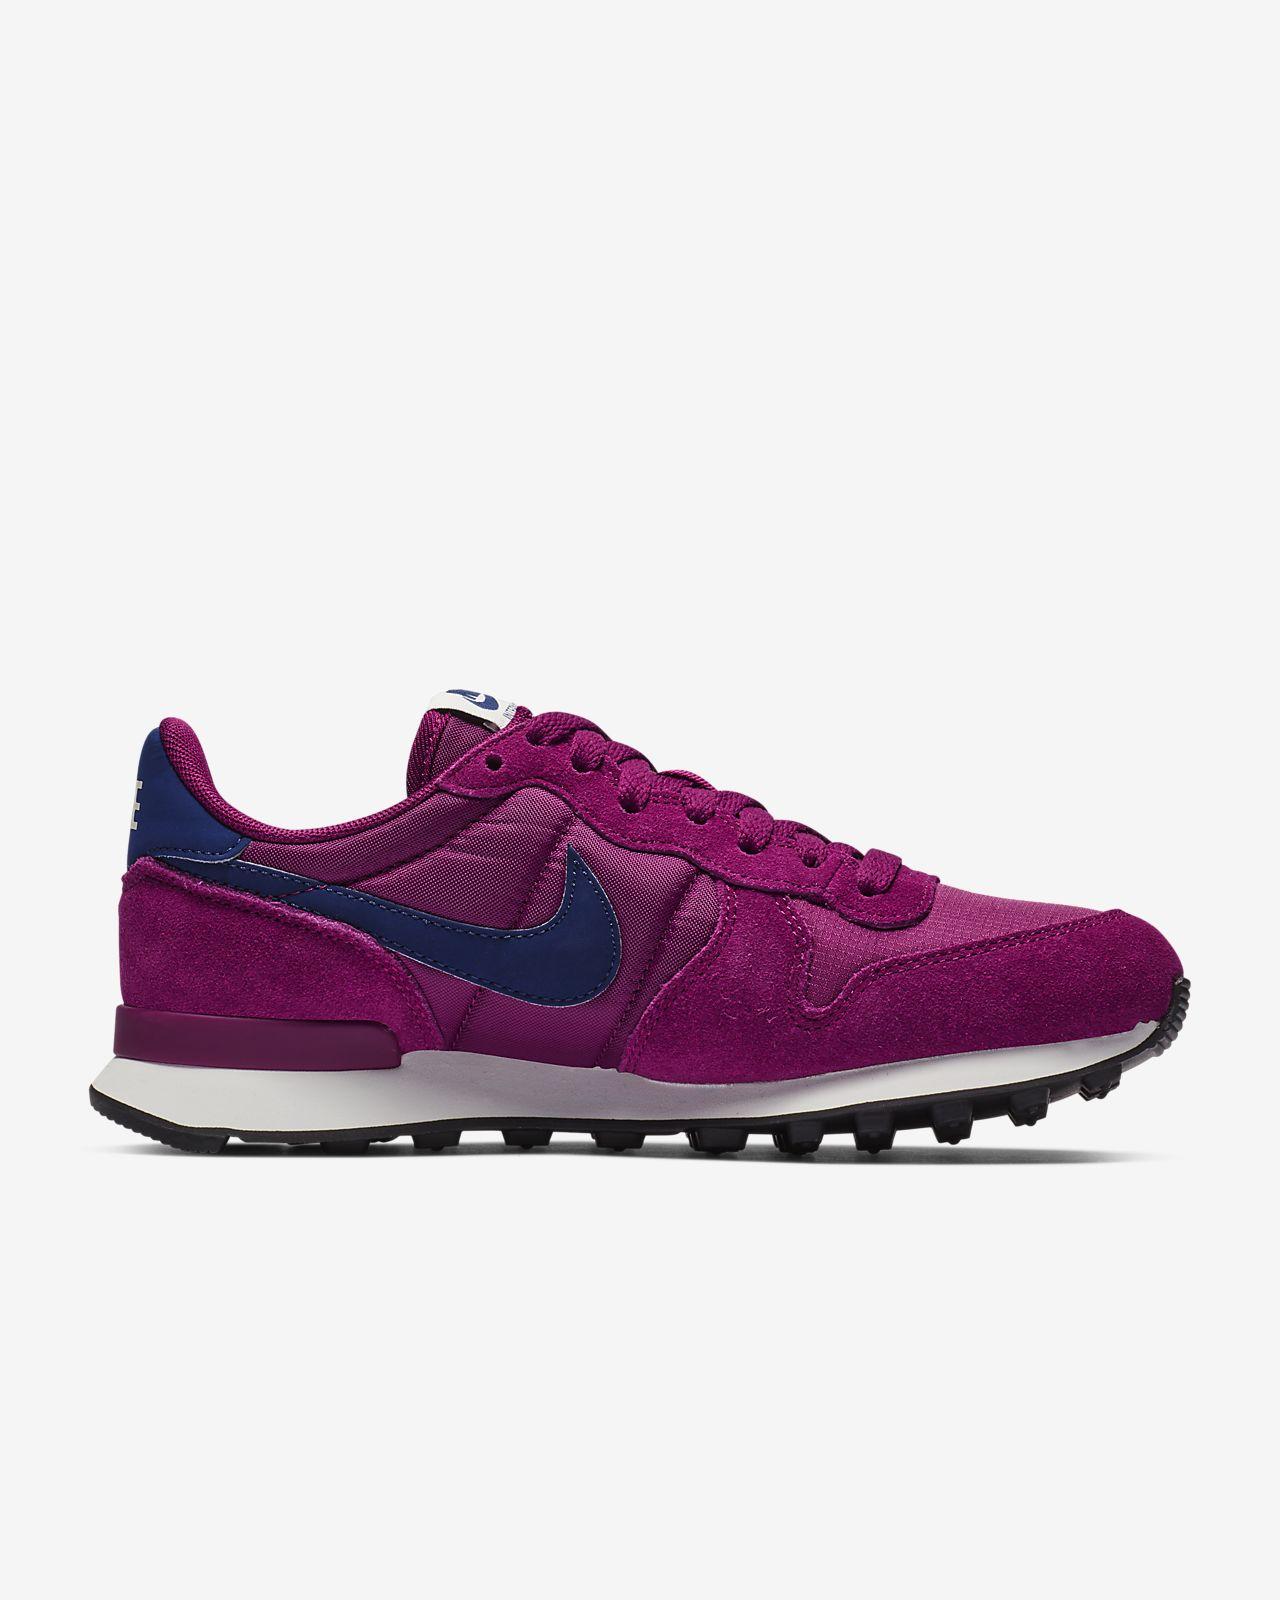 buy popular 5f874 ec324 Low Resolution Nike Internationalist Womens Shoe Nike Internationalist  Womens Shoe